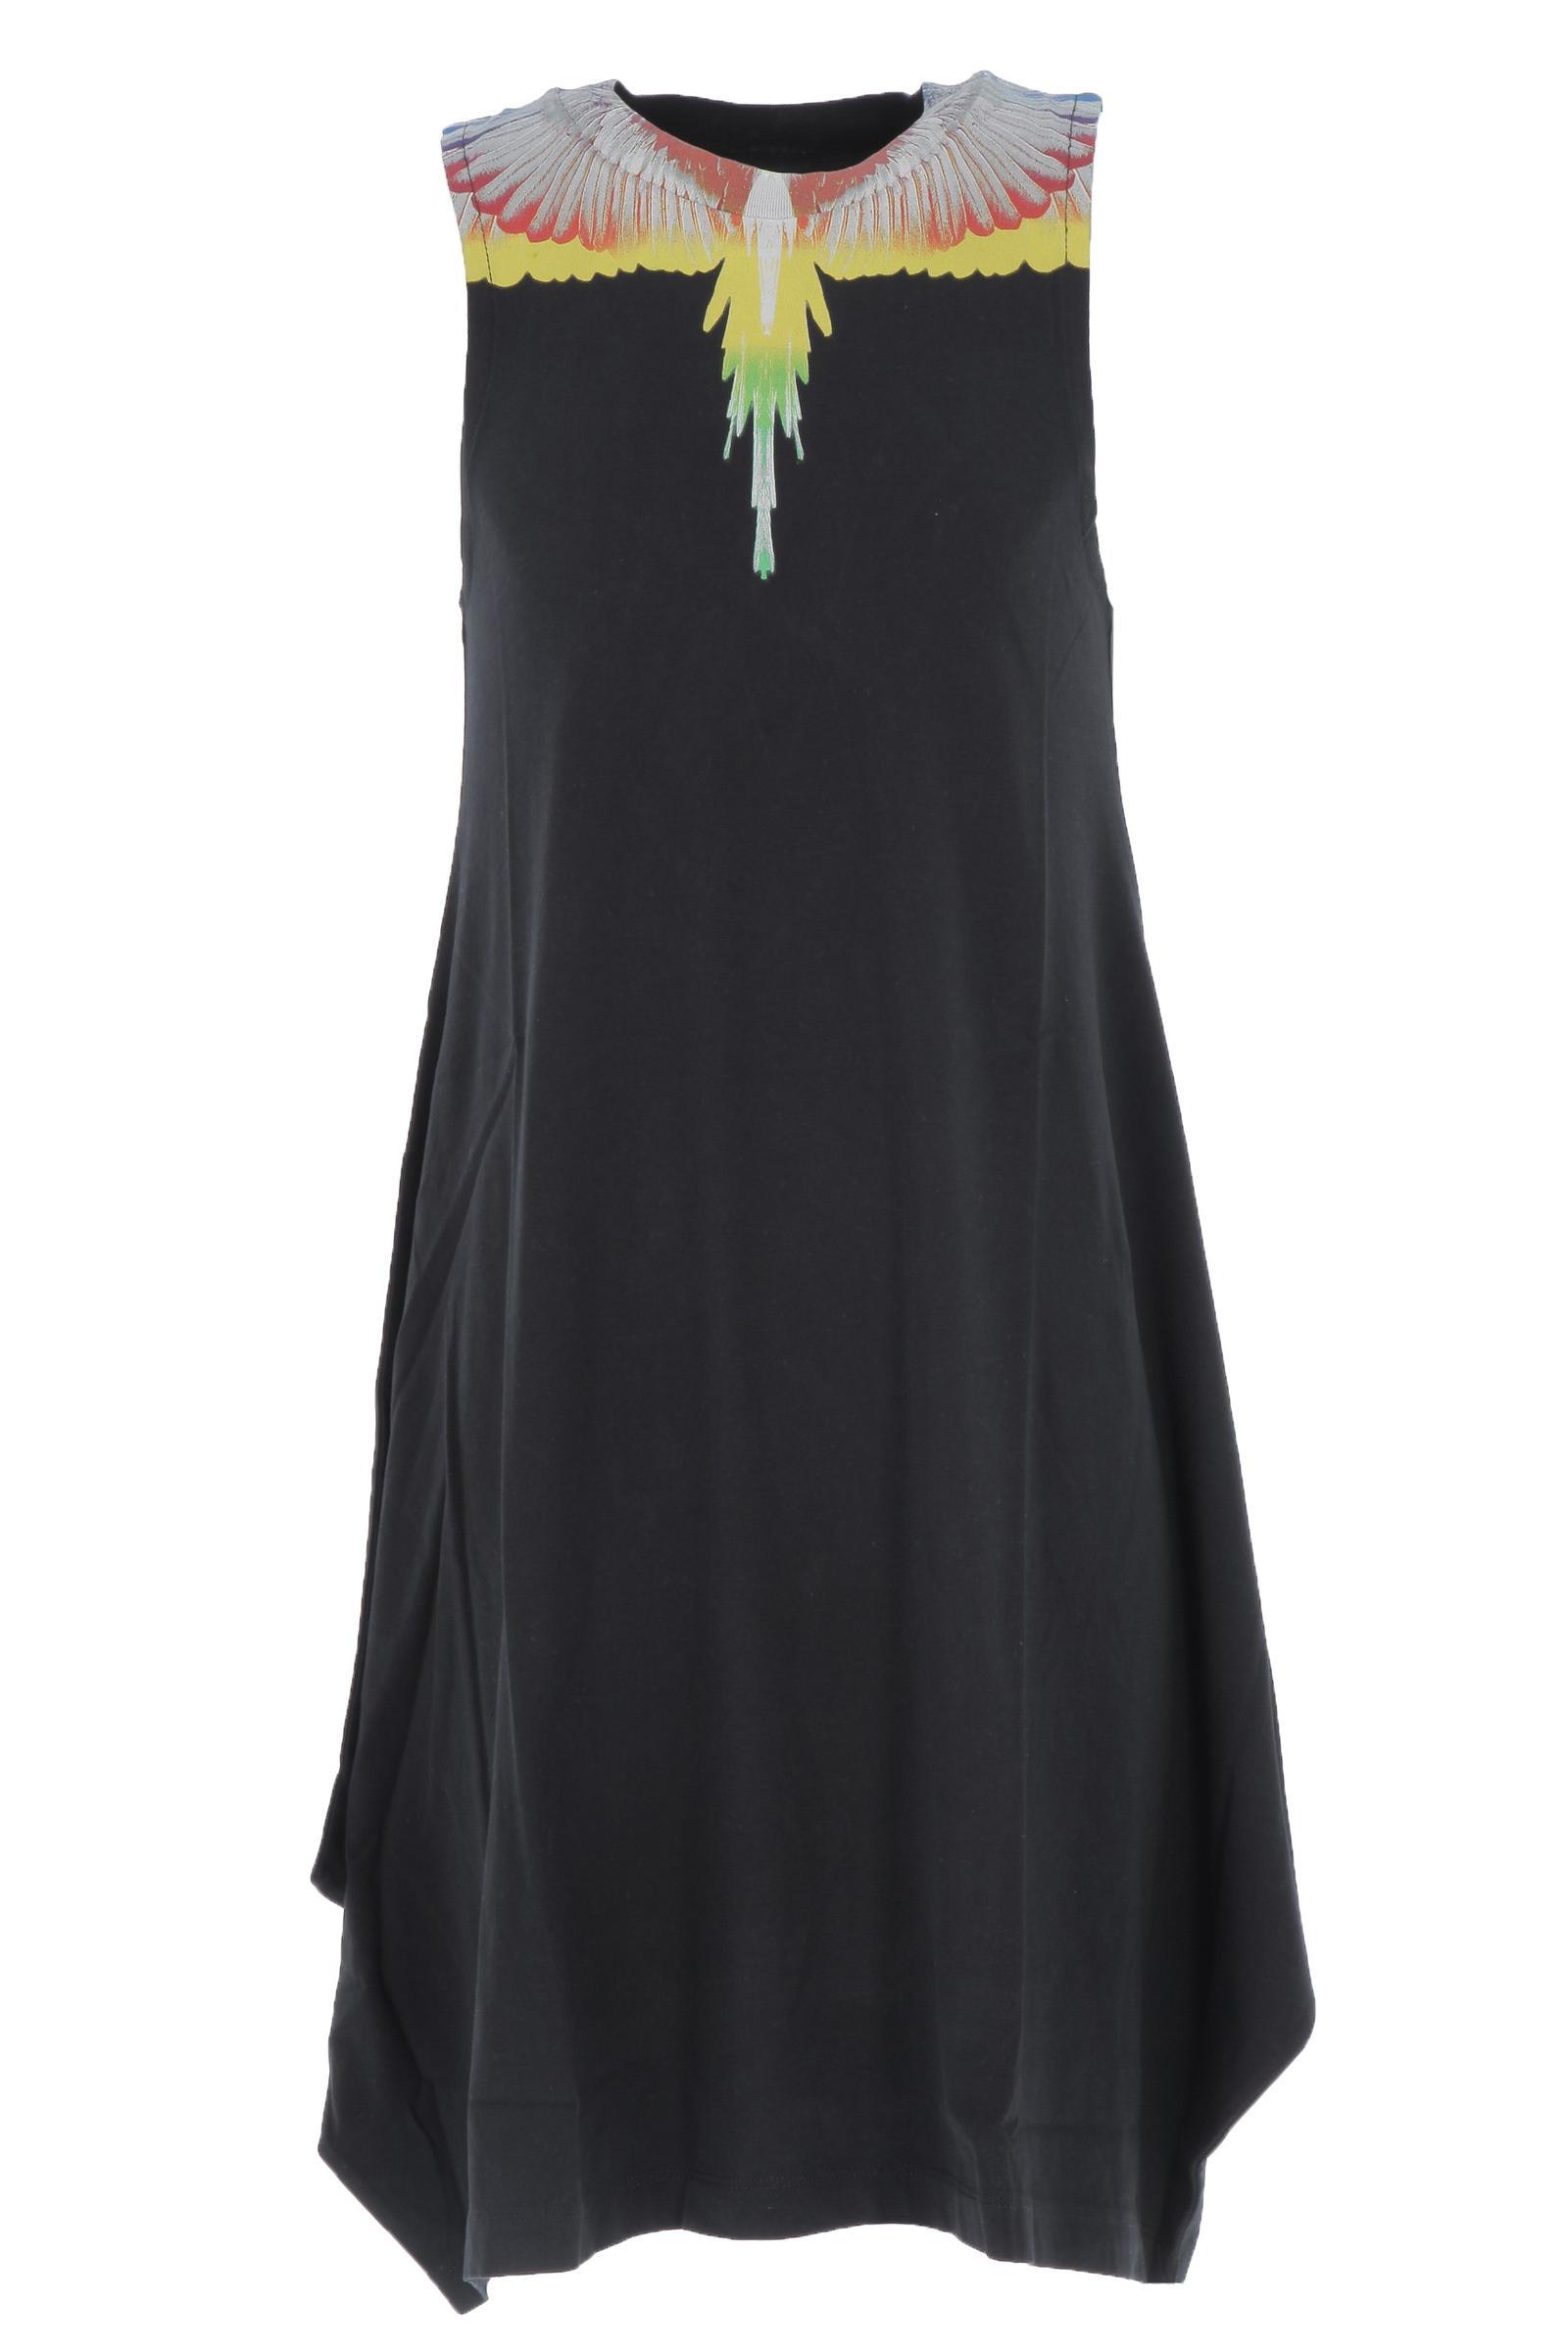 Burlon dress MARCELO BURLON KIDS OF MILAN | Informal dress | BMB41550010B010